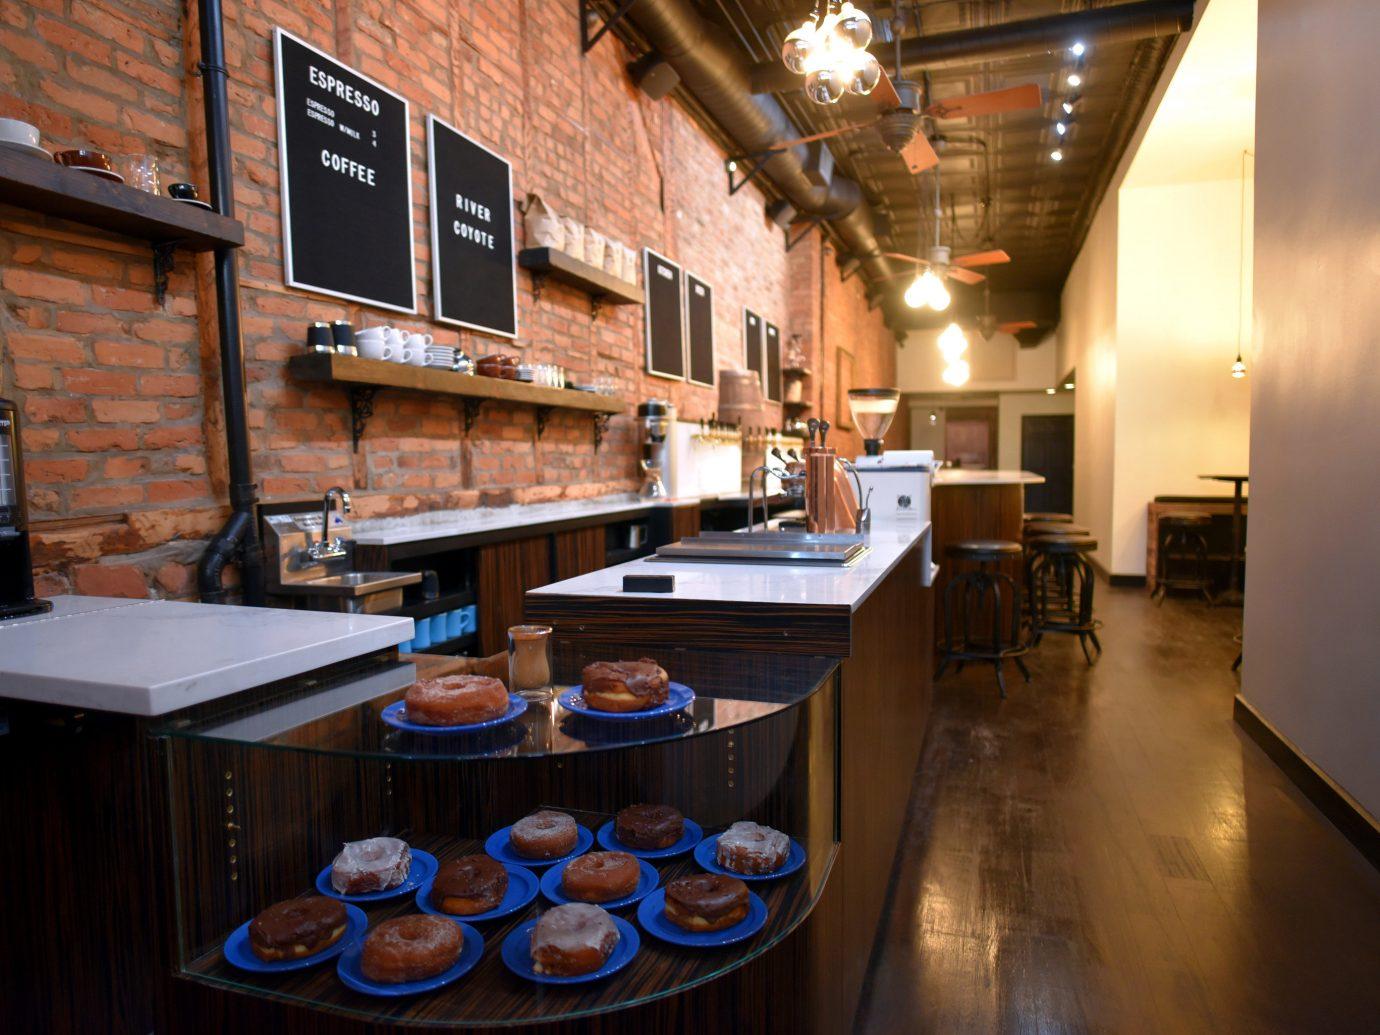 Food + Drink indoor floor room restaurant interior design home Kitchen Design Bar meal